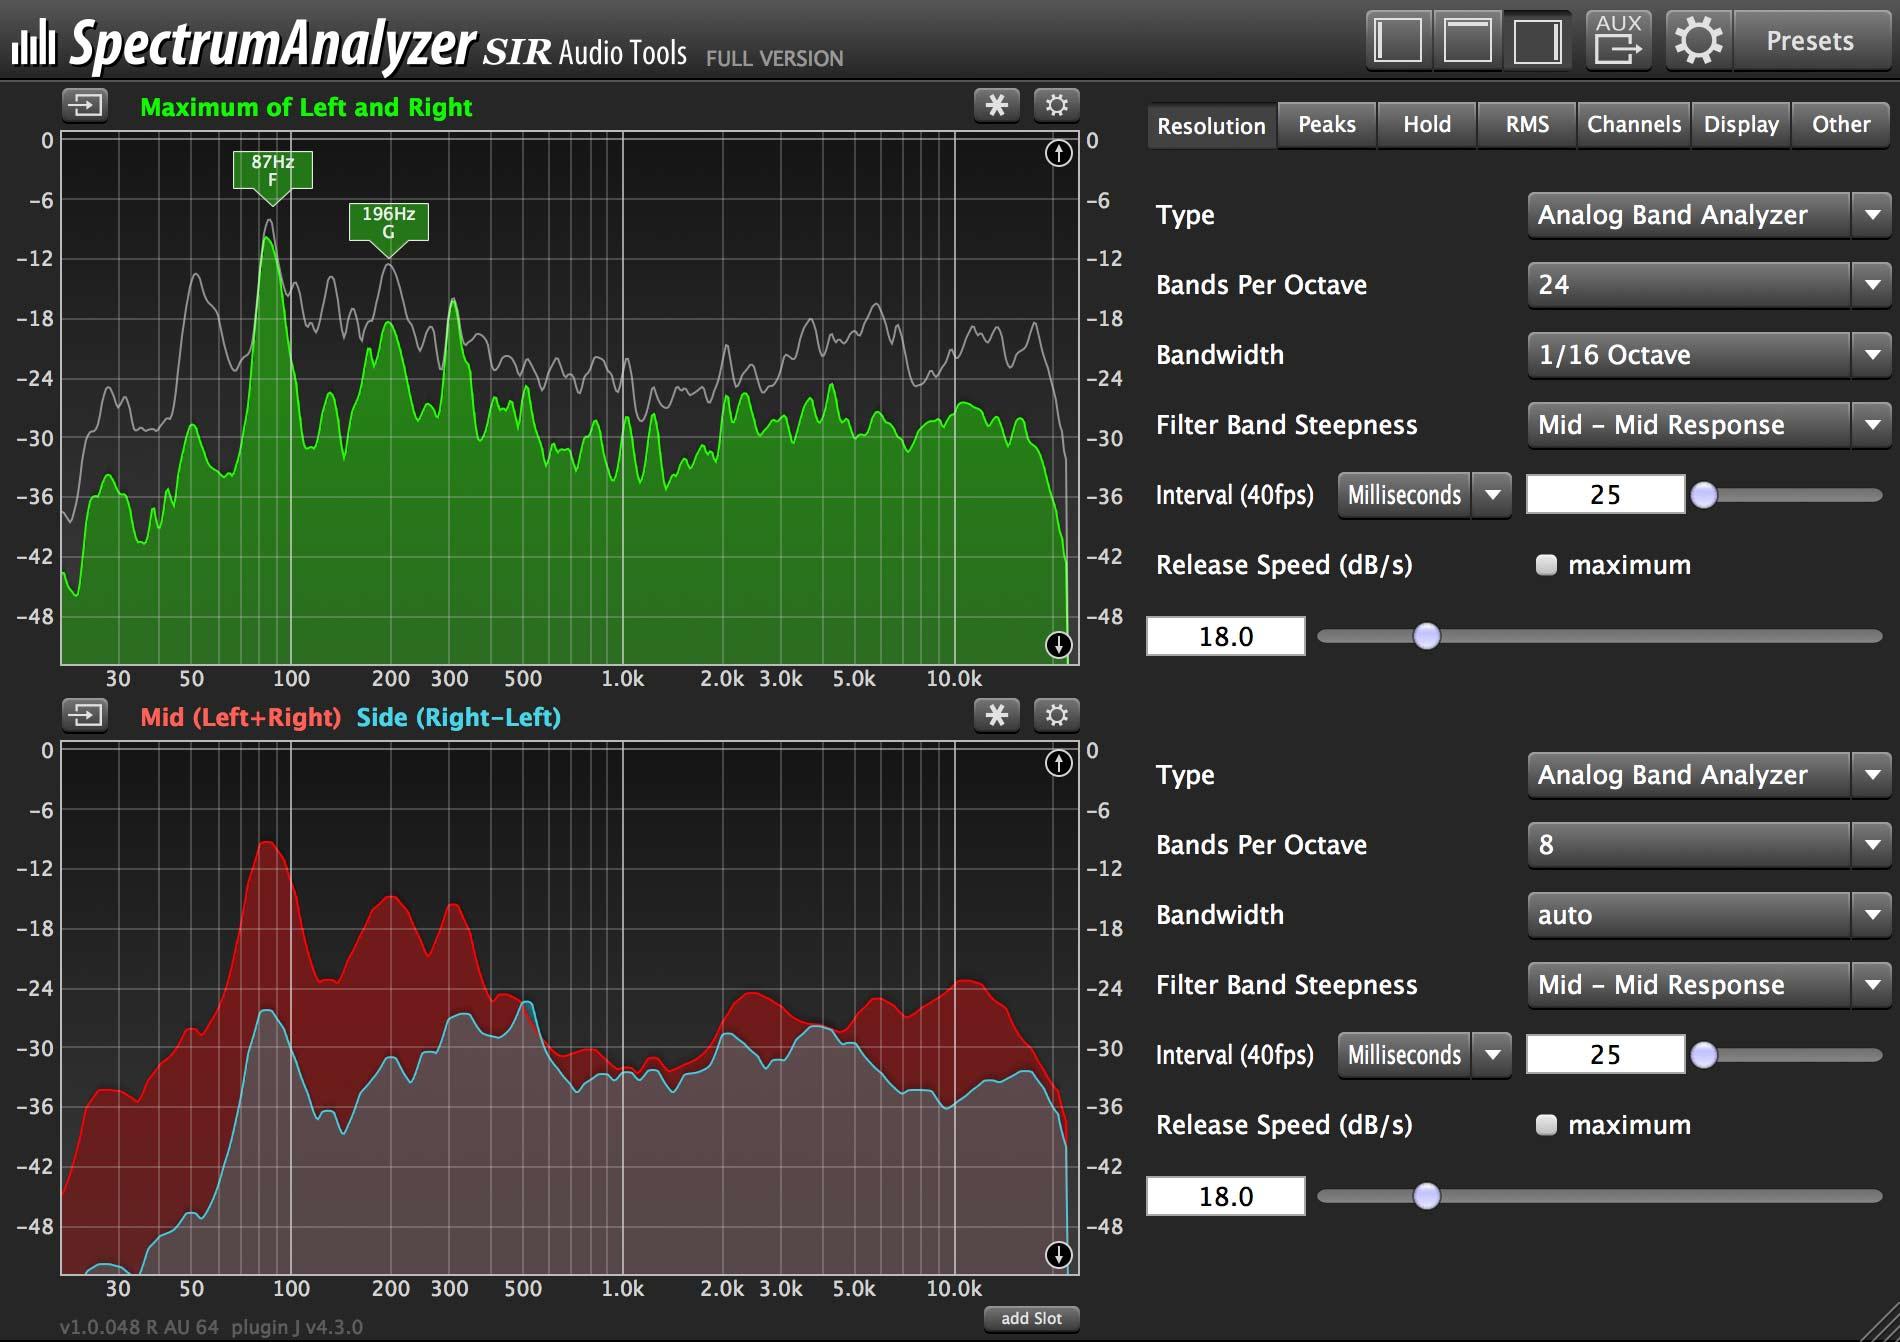 SpectrumAnalyzer | Details | SIR Audio Tools